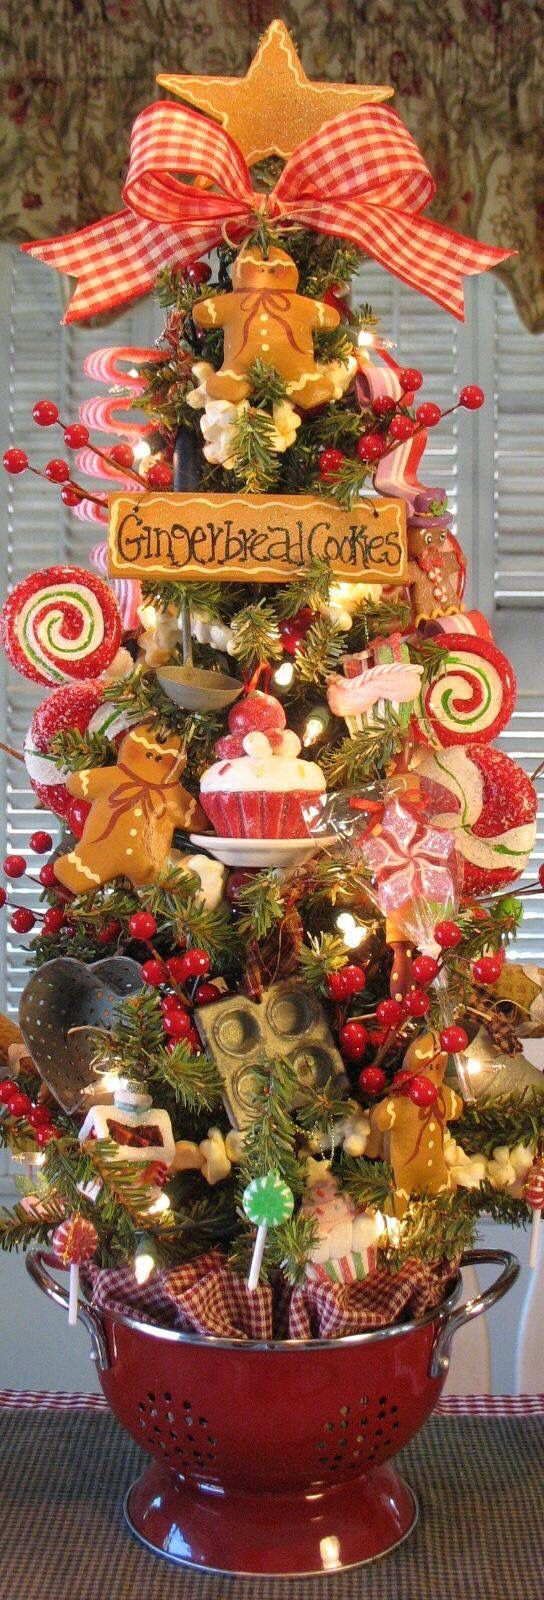 Love, love love this cute kitchen tree!